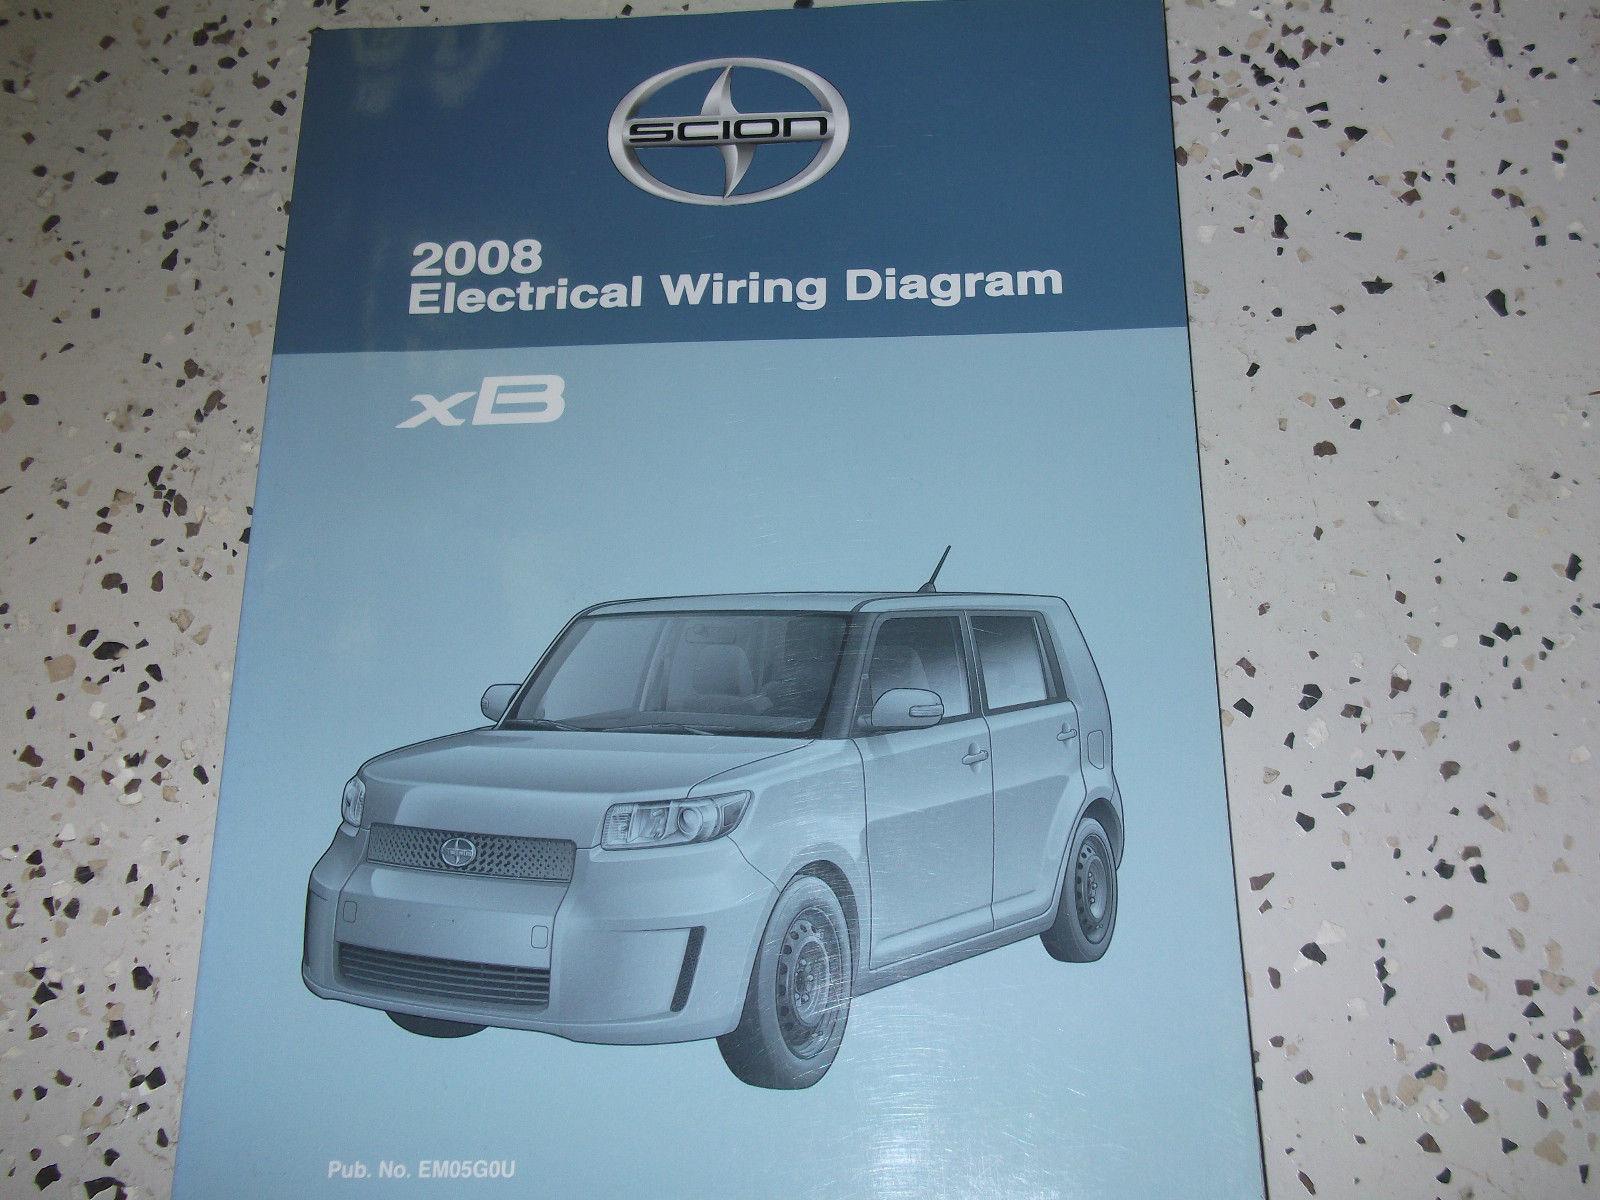 2008 toyota scion xb xb electrical wiring and 50 similar items rh bonanza com Toyota Tis Website Vehicle Repair Manuals